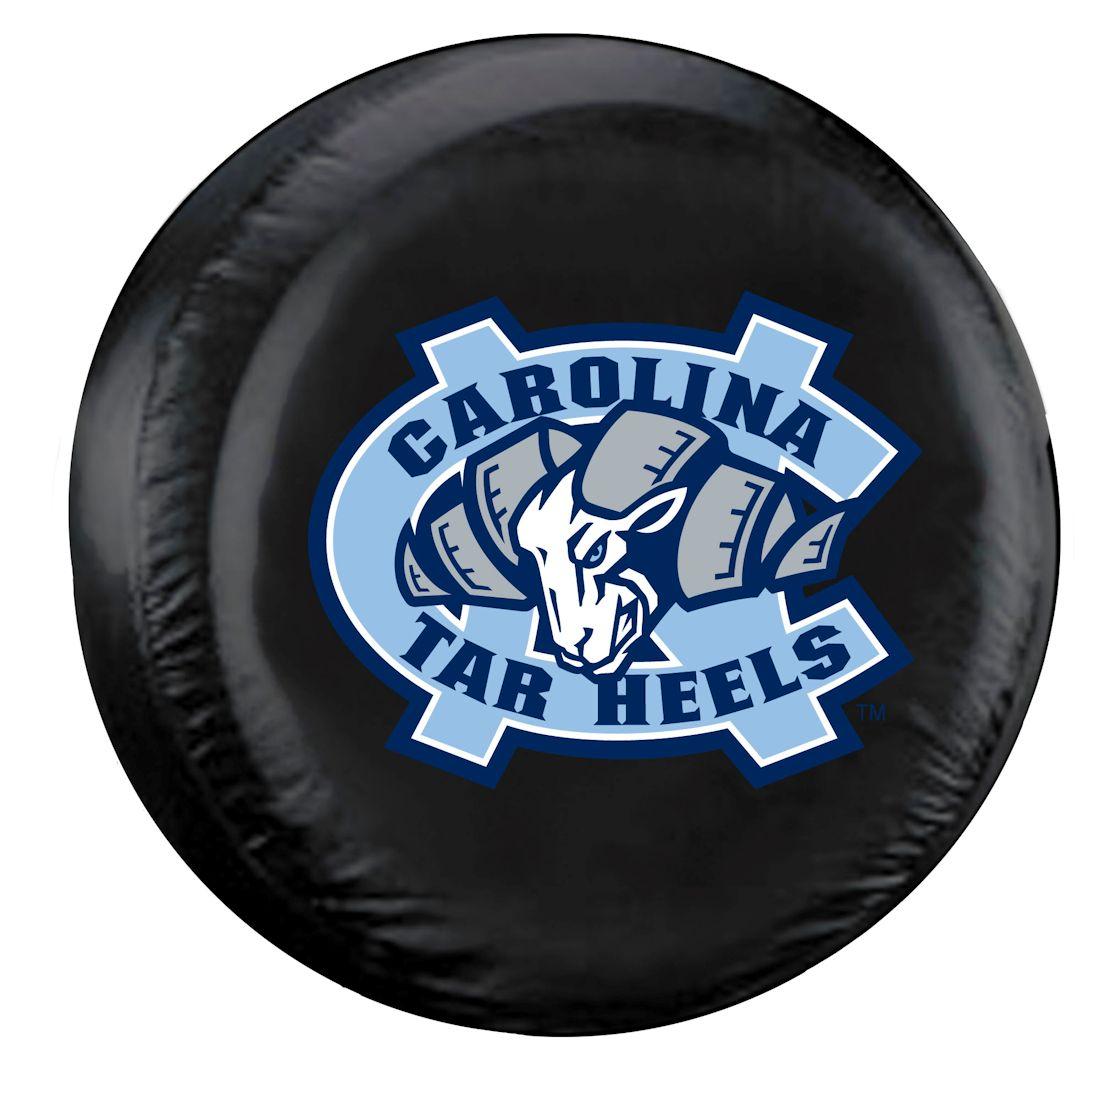 North Carolina Tar Heels Black Tire Cover - Standard Size